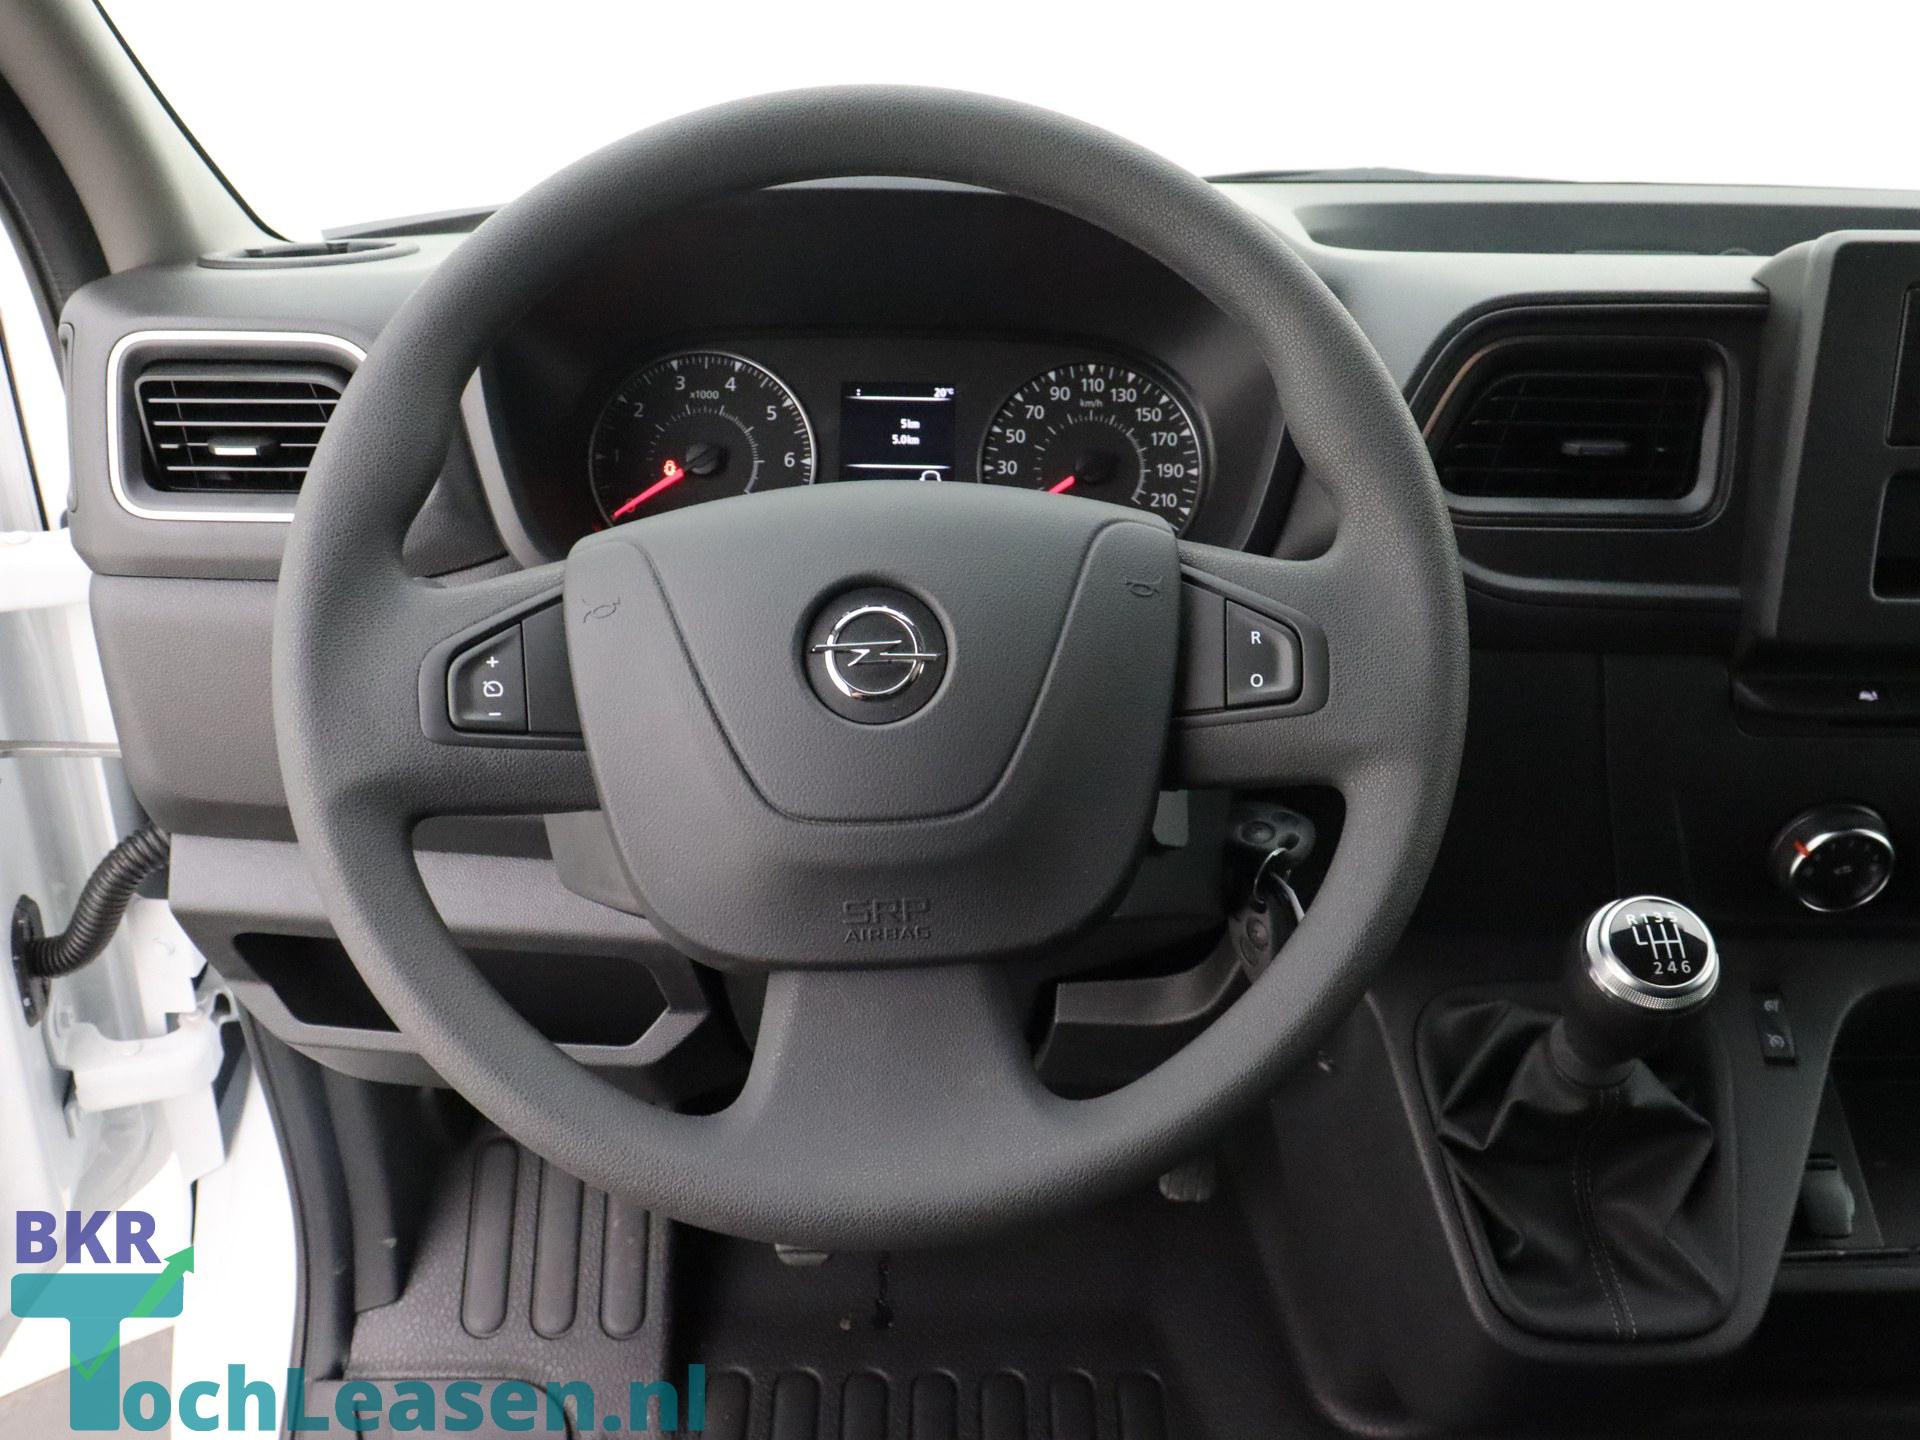 BKRTochLeasen.nl - Opel Movano - L3H2 - wit 17